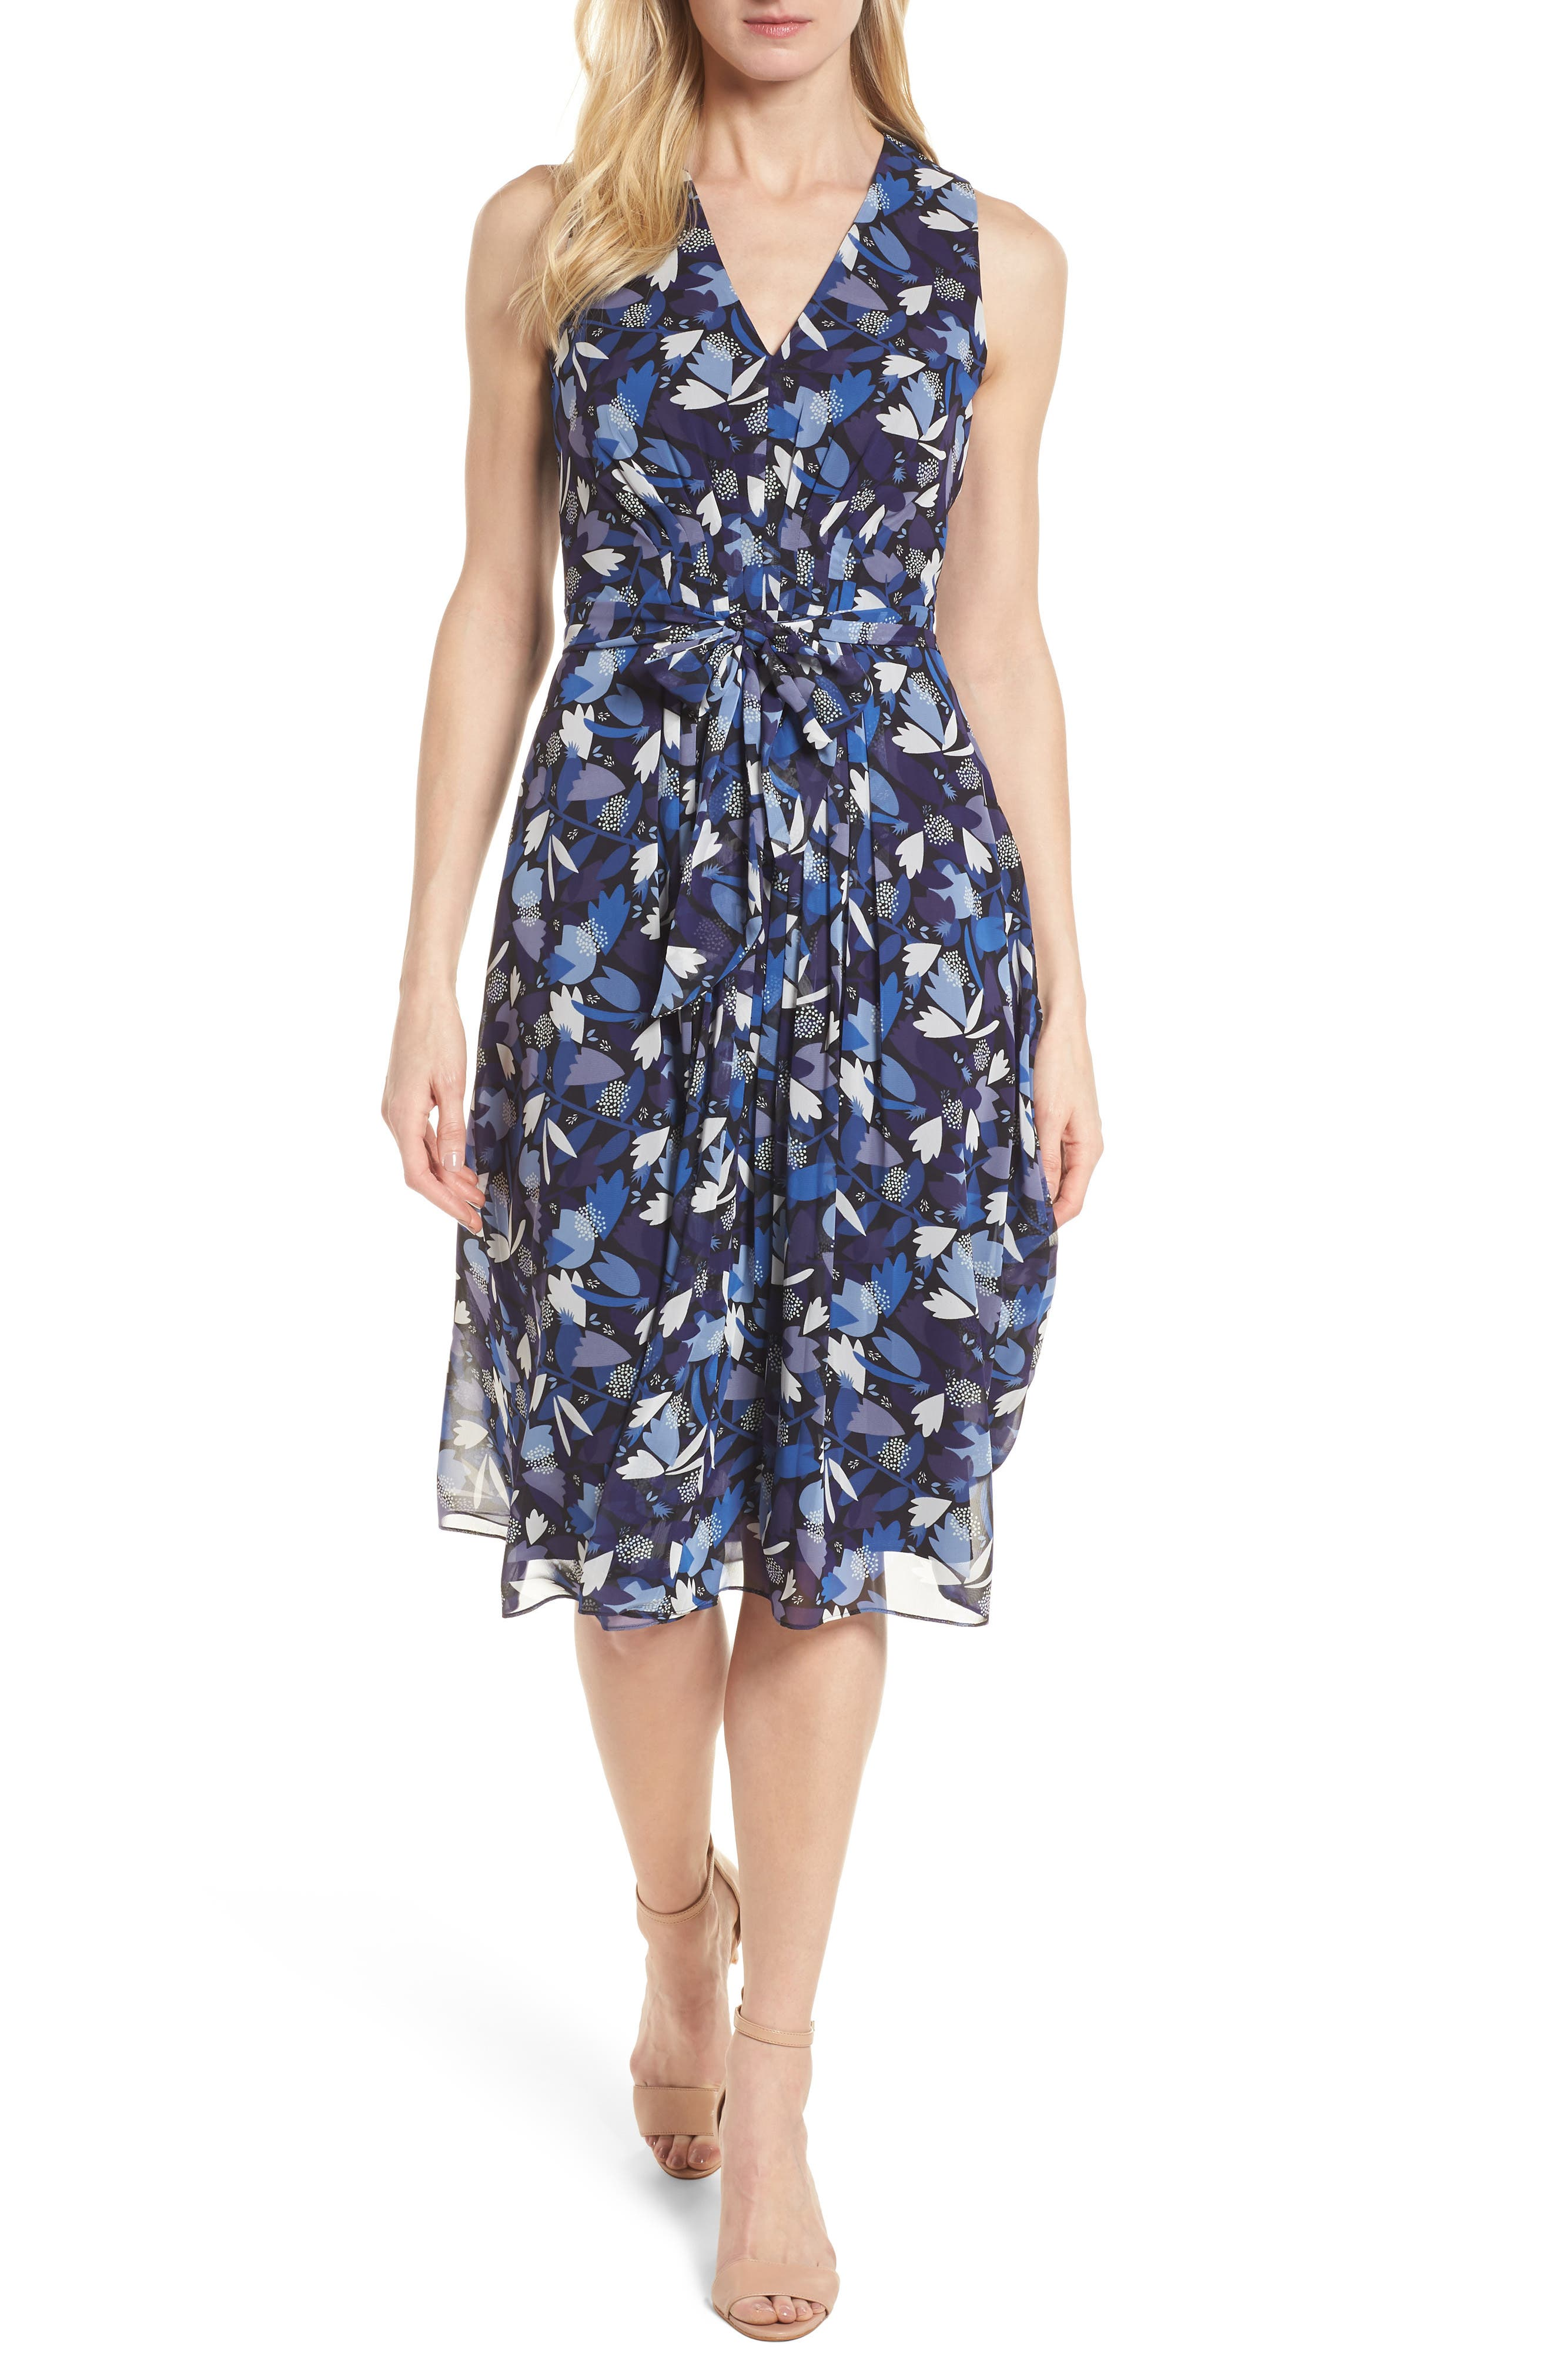 Amalfi Print Chiffon Dress,                             Main thumbnail 1, color,                             410